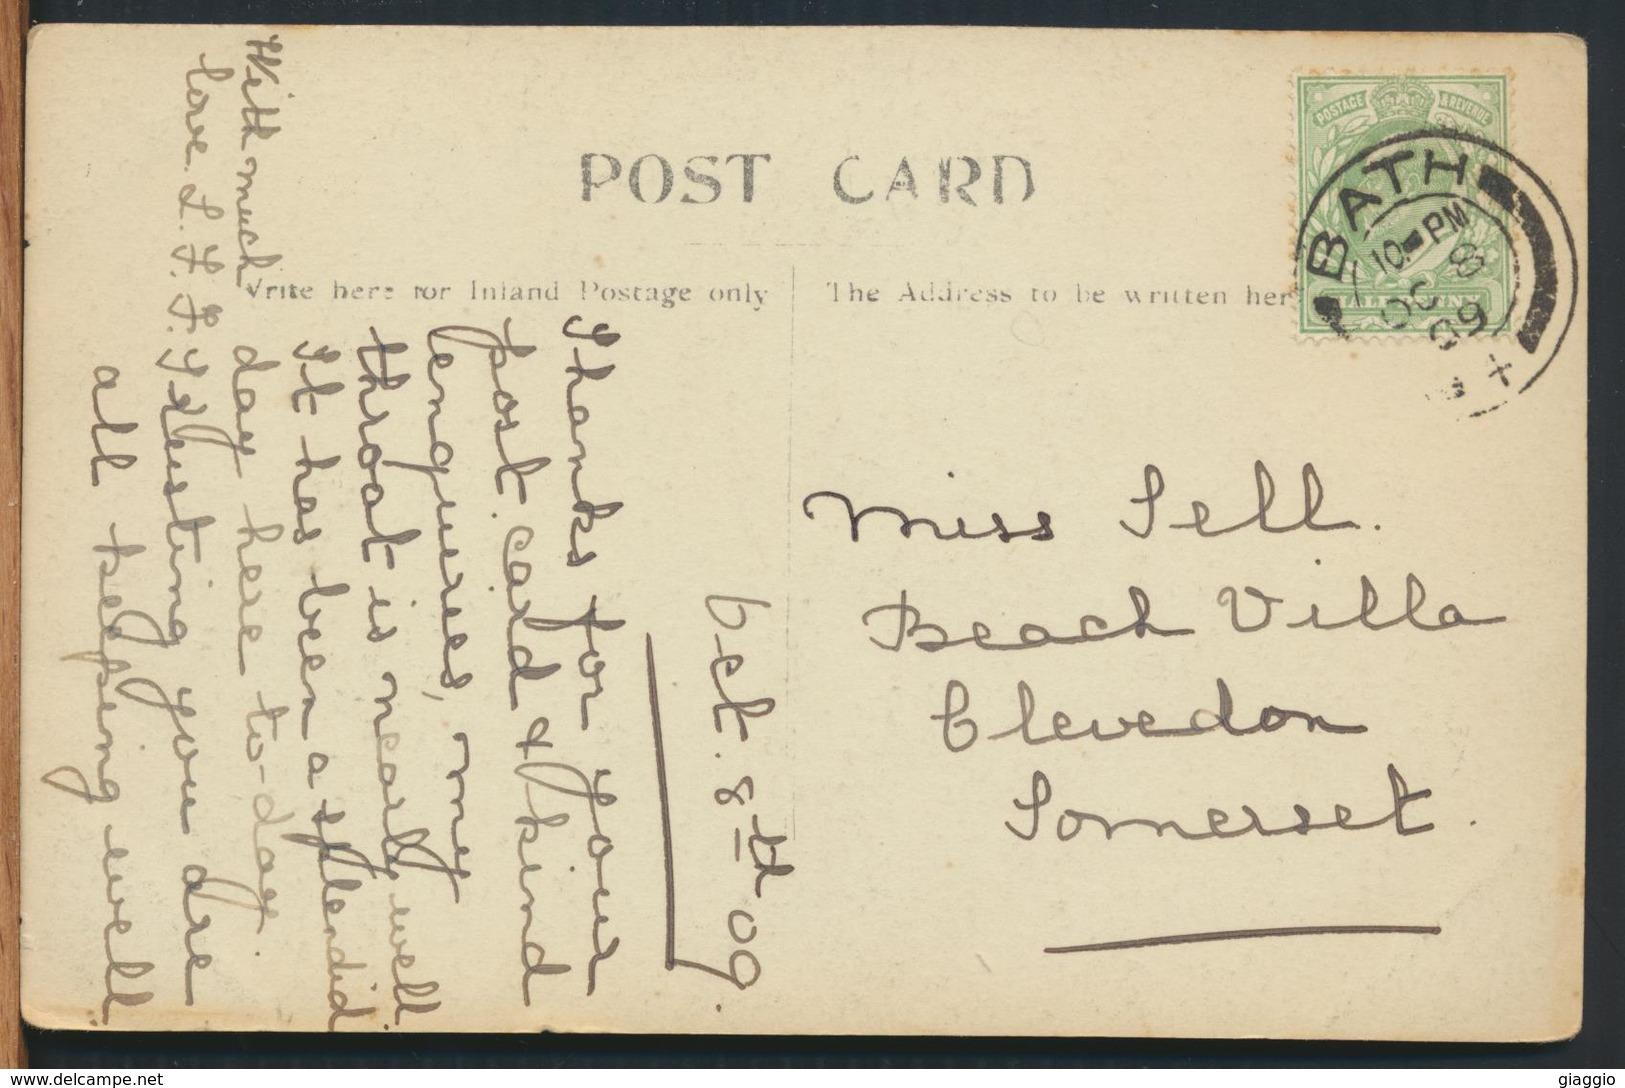 °°° 11897 - UK - BATH - 1909 With Stamps °°° - Bath